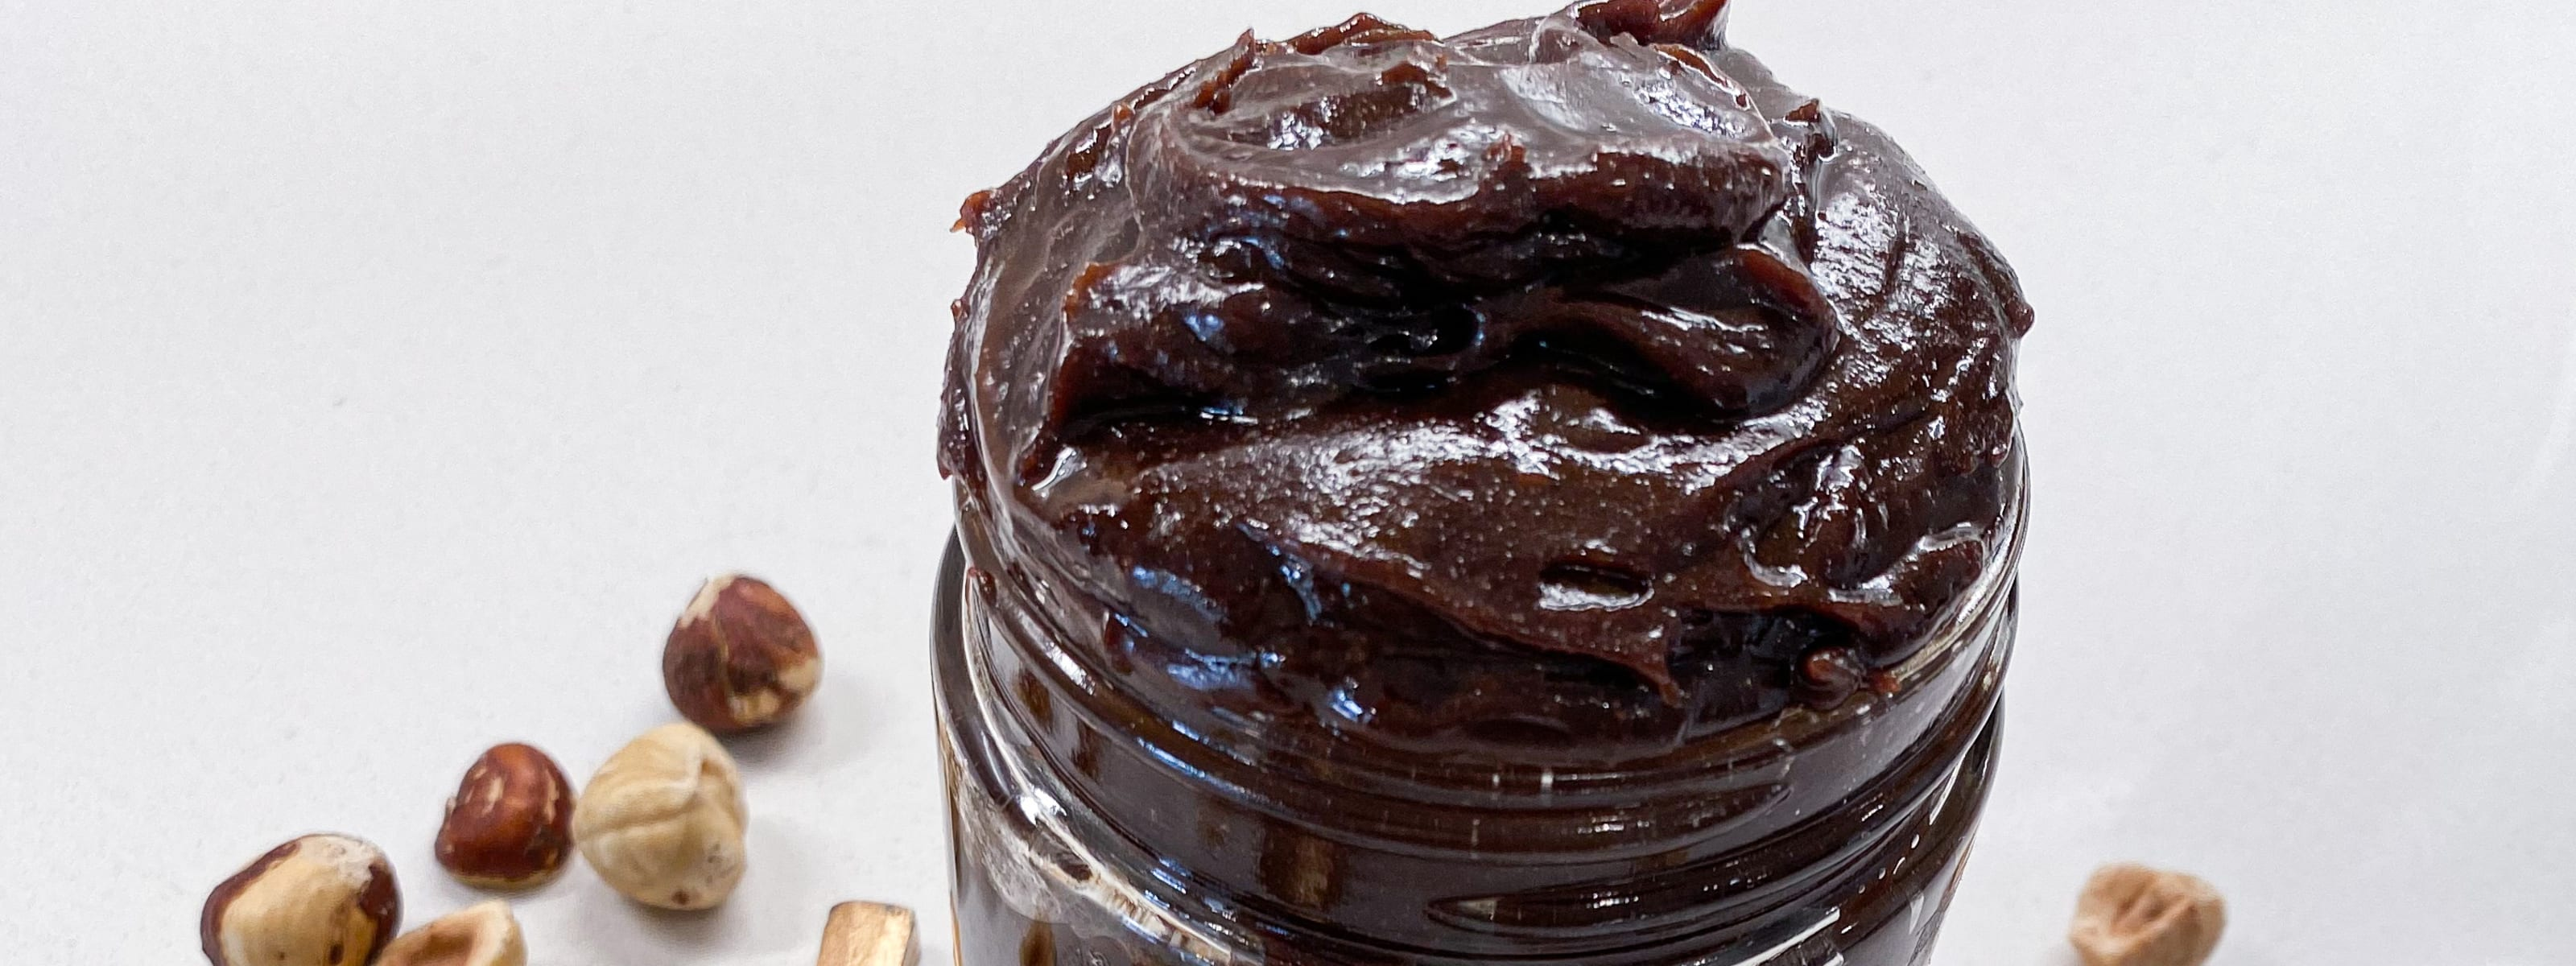 Nutella in a Jar